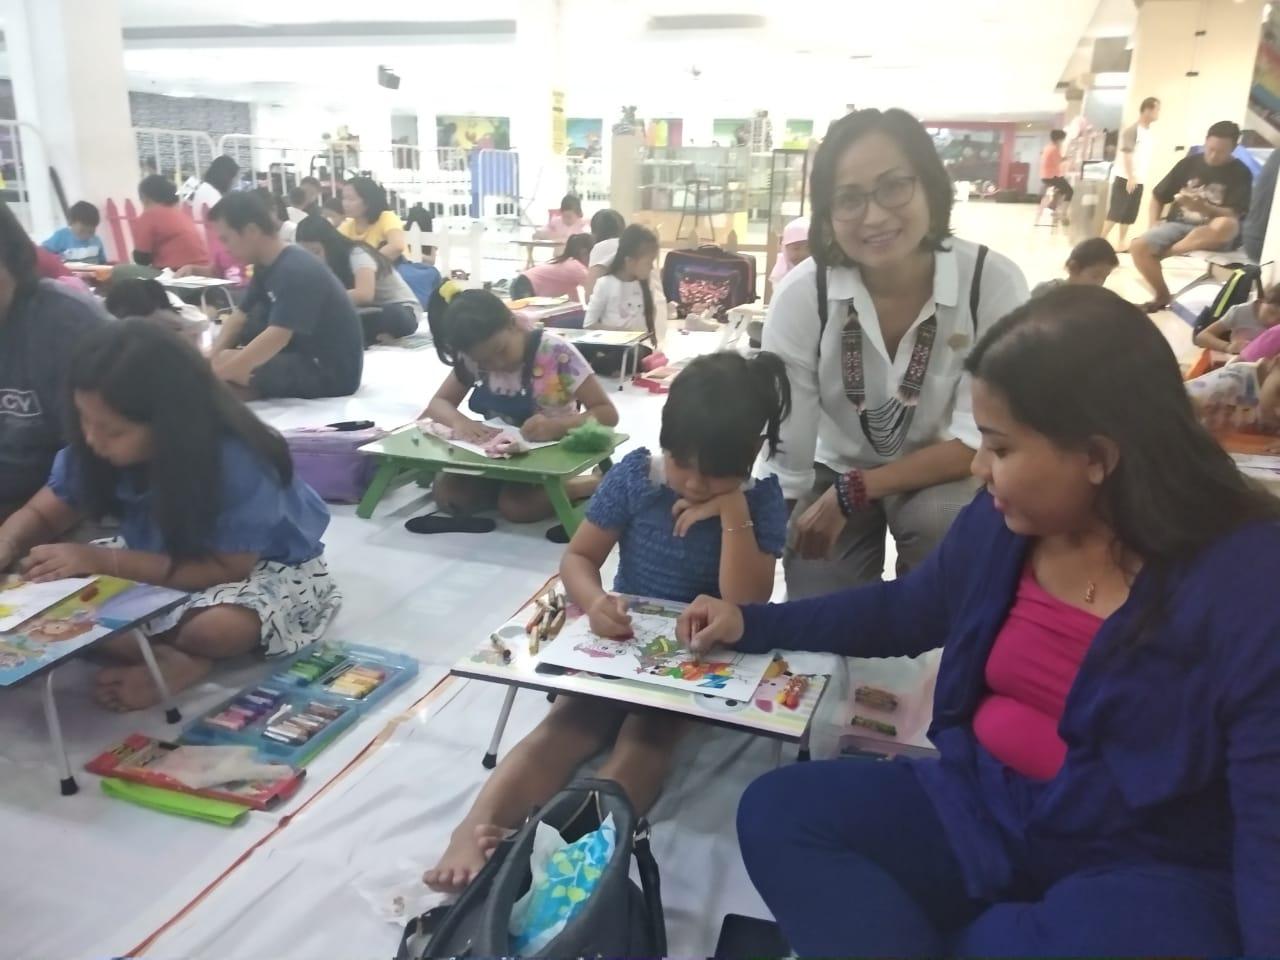 Anggota DPRD Denpasar Emiliana Sri Wahjuni Dukung Anak Anak